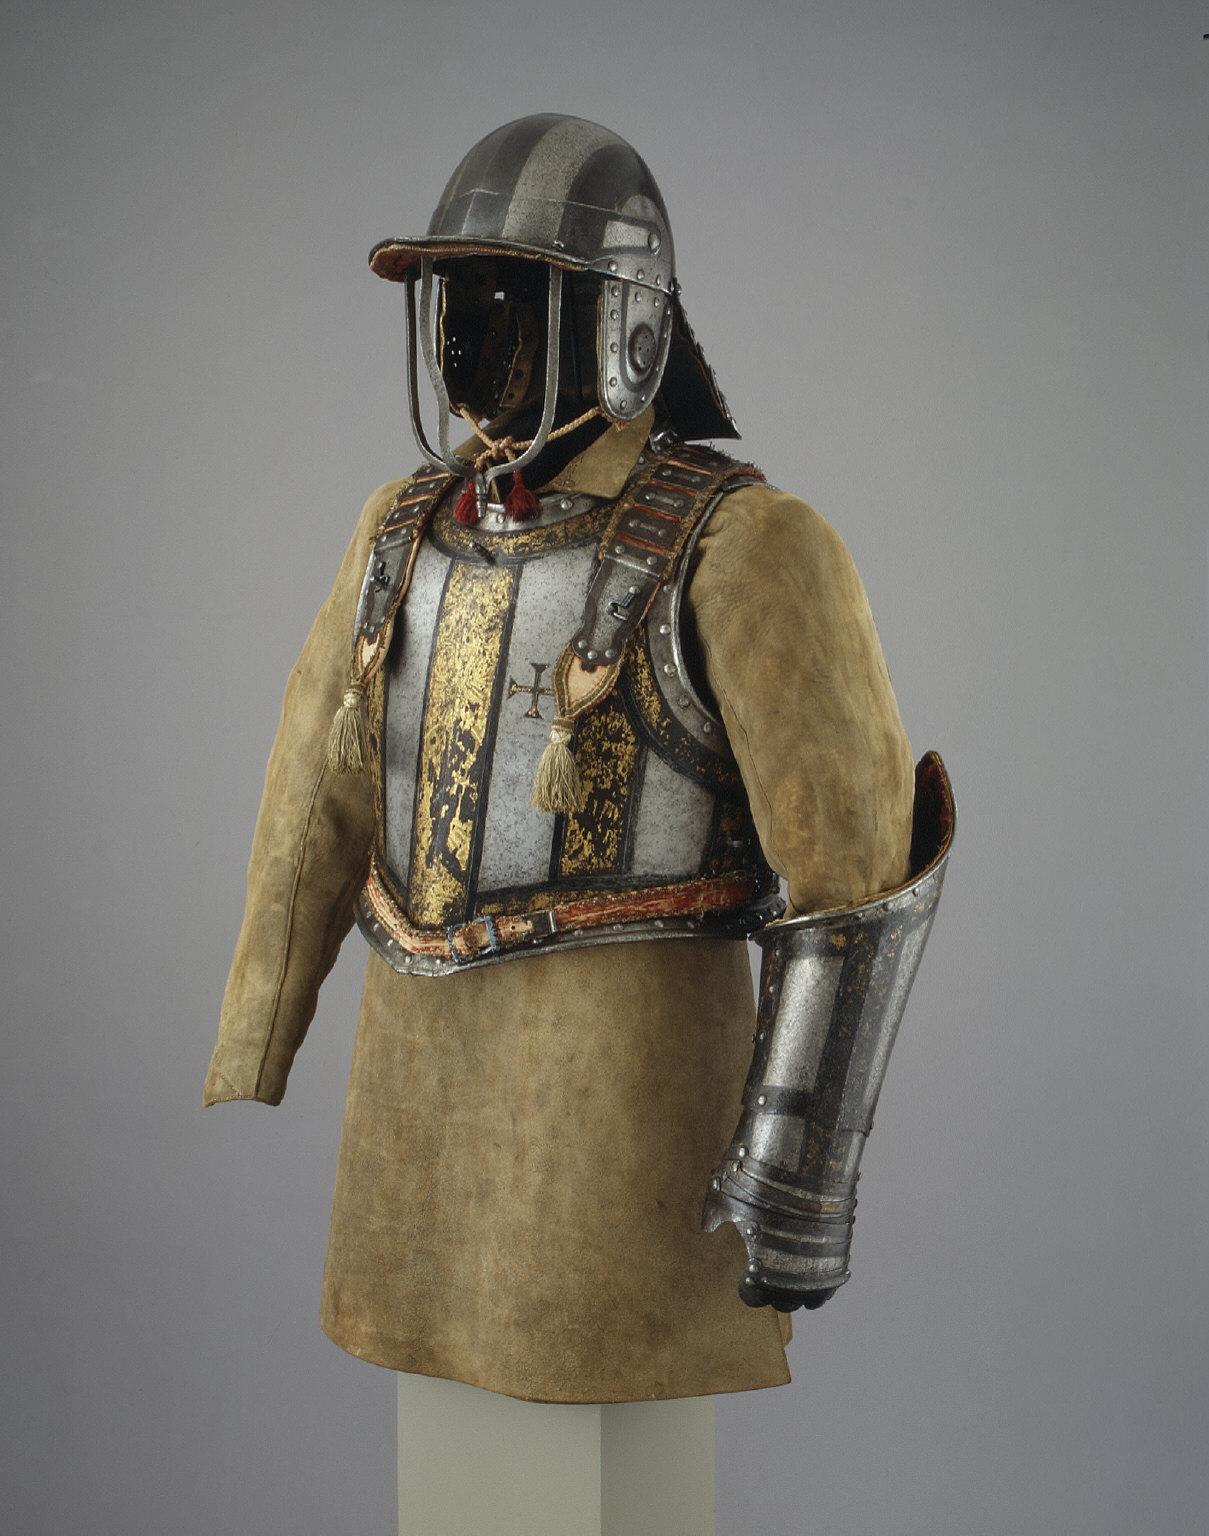 Harquebus Armor of Pedro II, King of Portugal